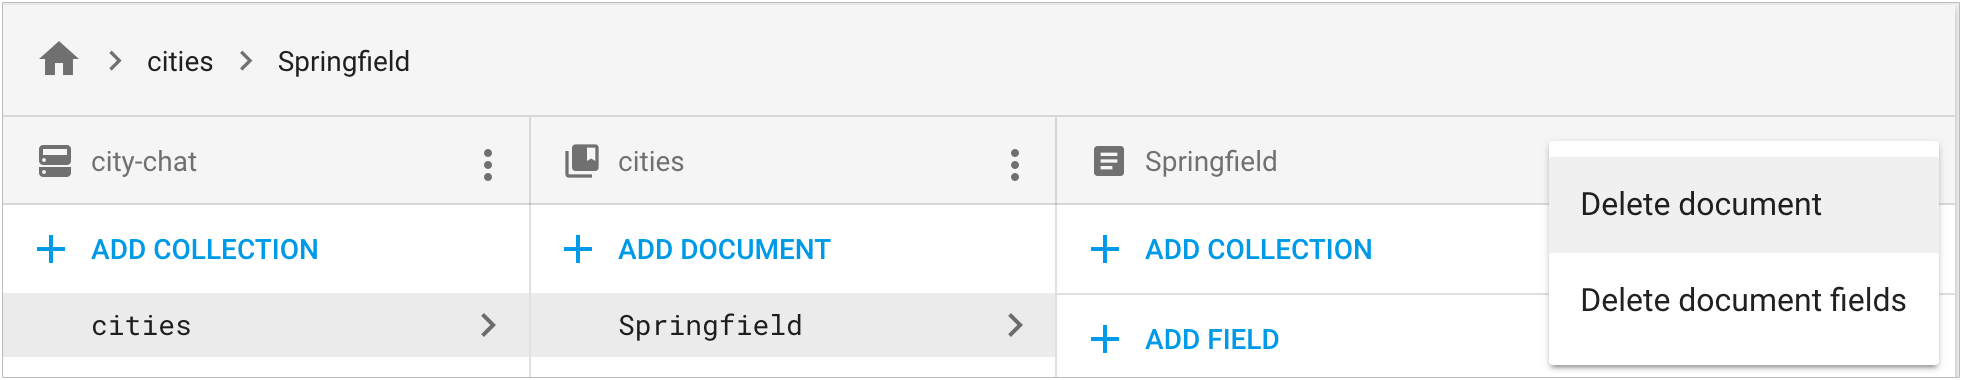 Klik Hapus dokumen atau Hapus kolom dokumen dari menu konteks di kolom rincian dokumen